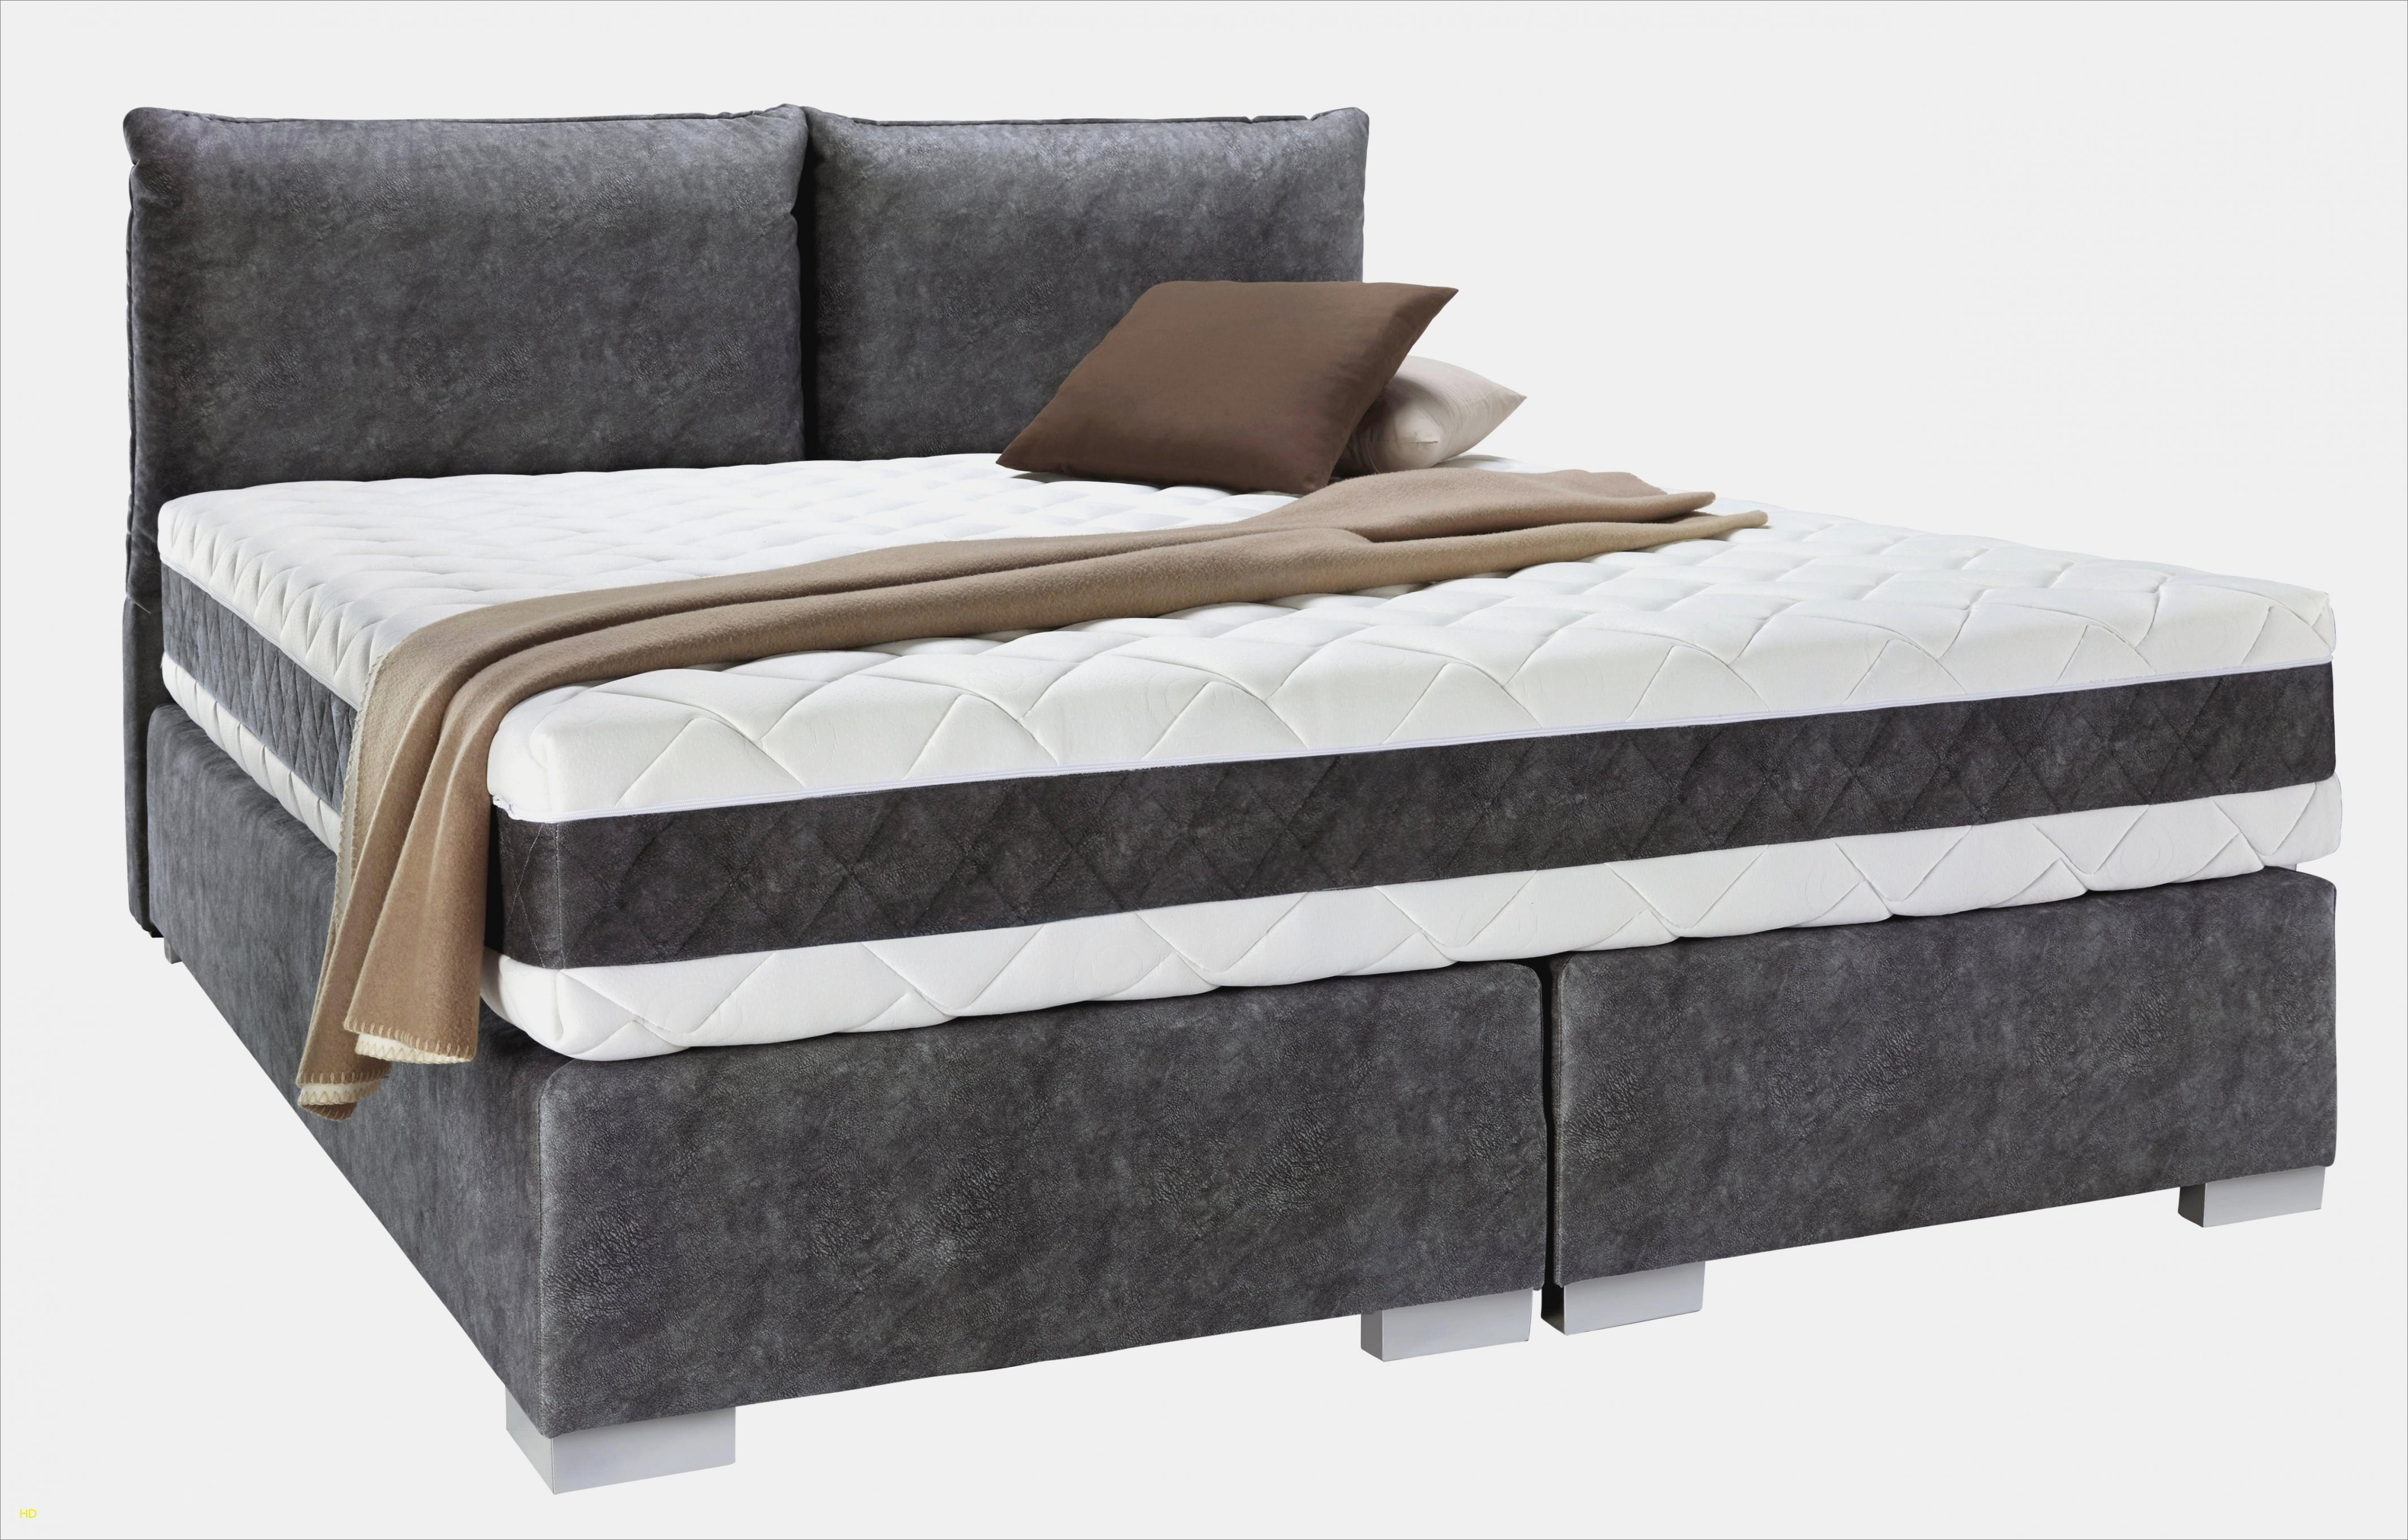 ikea topmatras 160 200 unique ikea betten boxspring foto 39 s het von betten ikea 160x200 bild. Black Bedroom Furniture Sets. Home Design Ideas